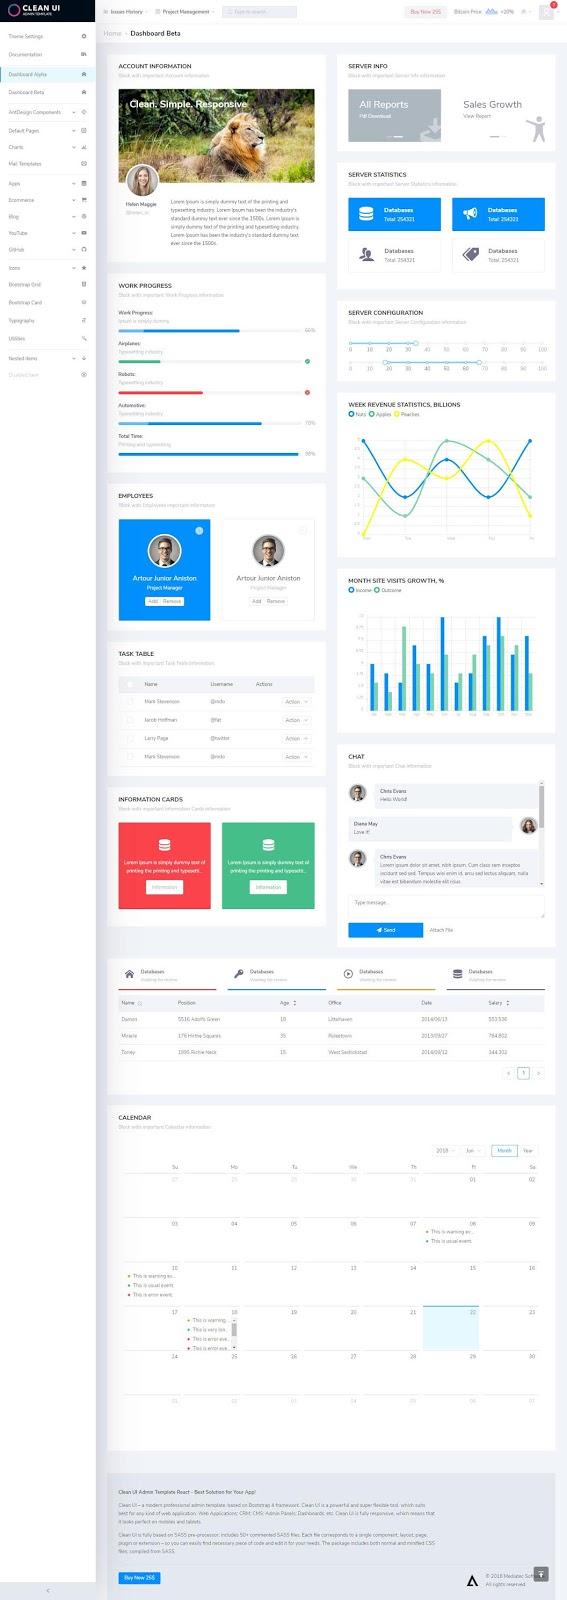 Clean UI HTML - Template Admin Panel Profesional Modern